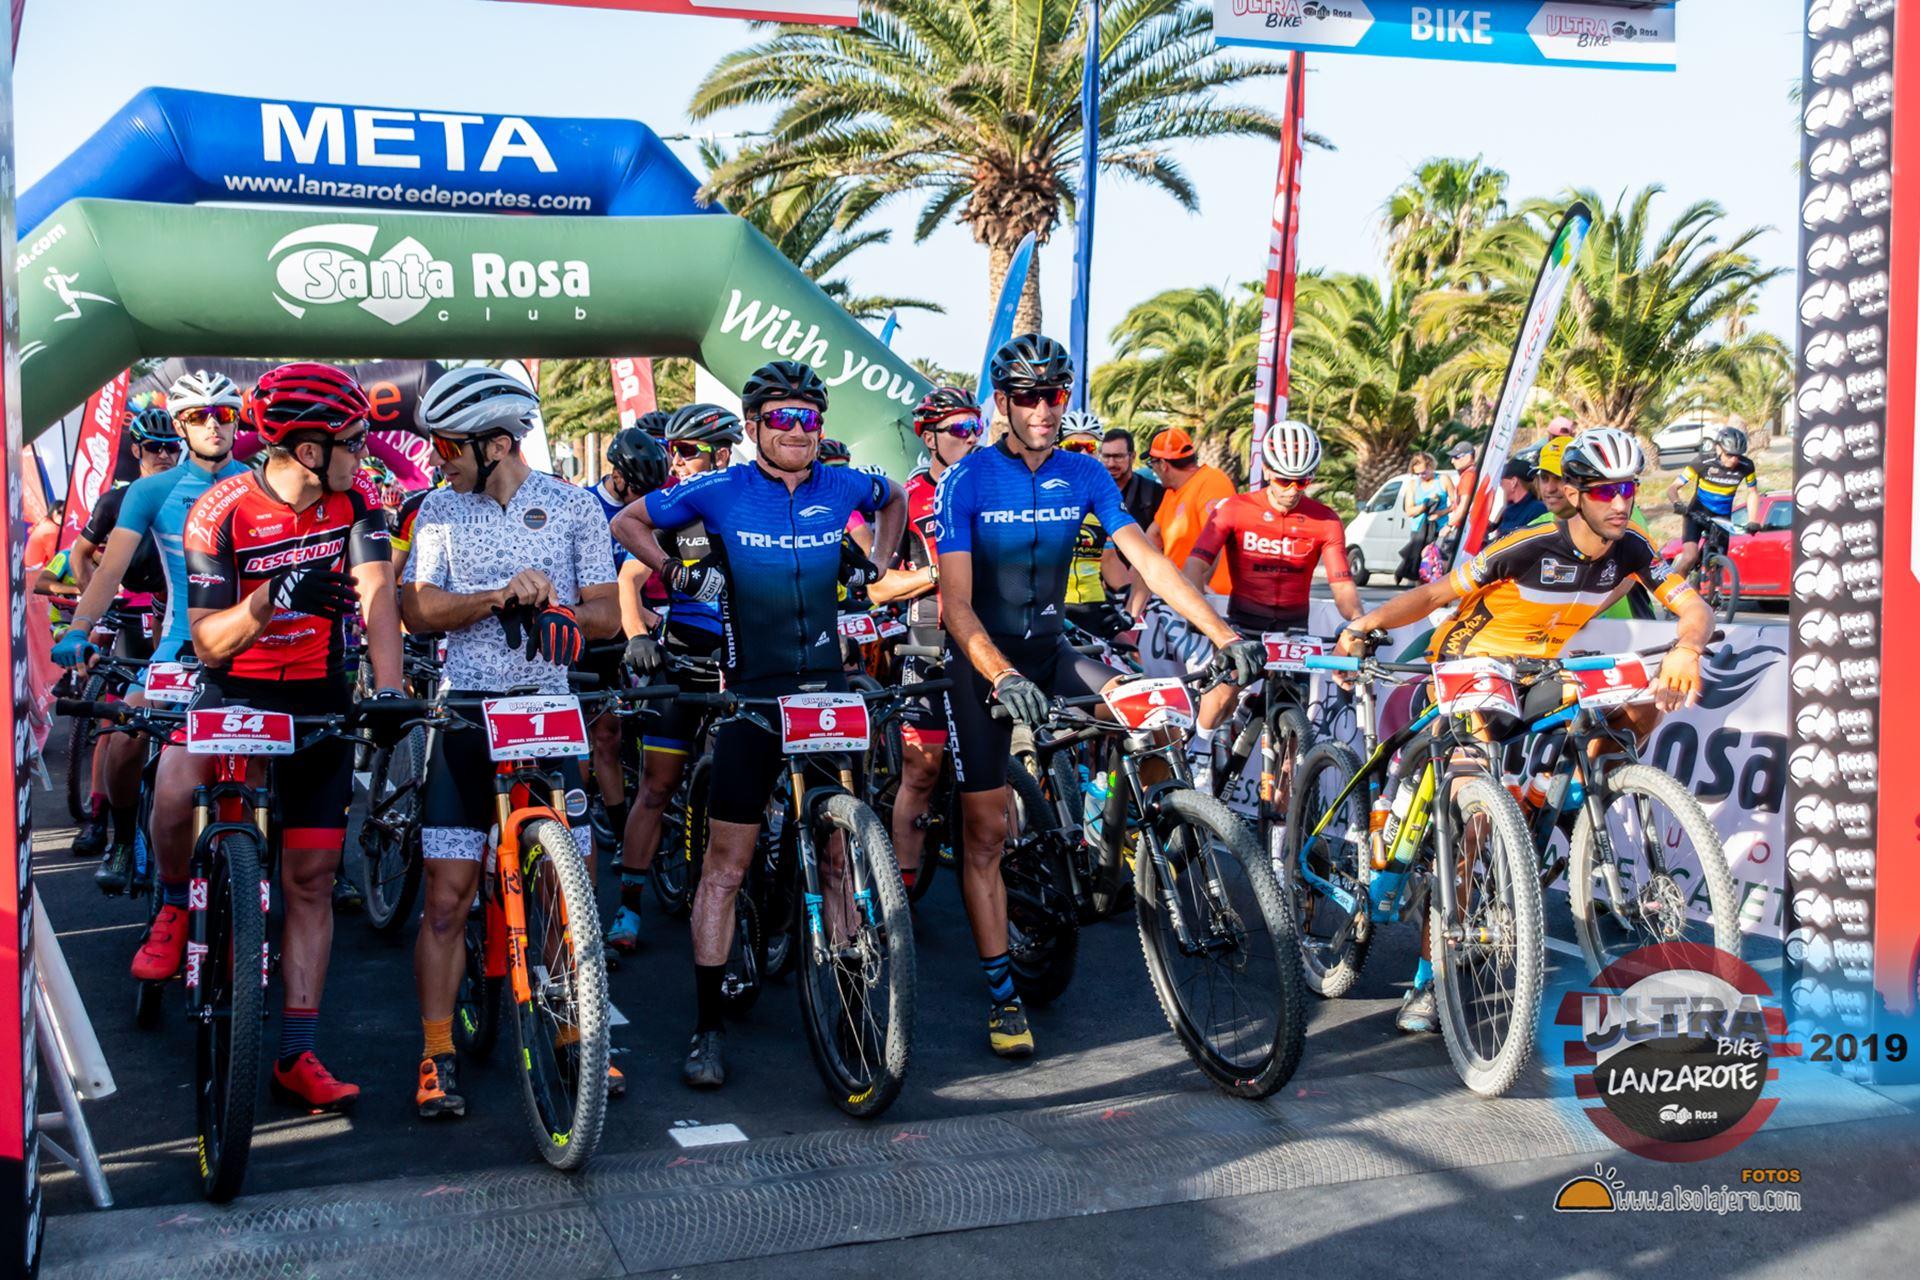 Salida 2ª Etapa Ultrabike 2019 Fotos Alsolajero.com-16